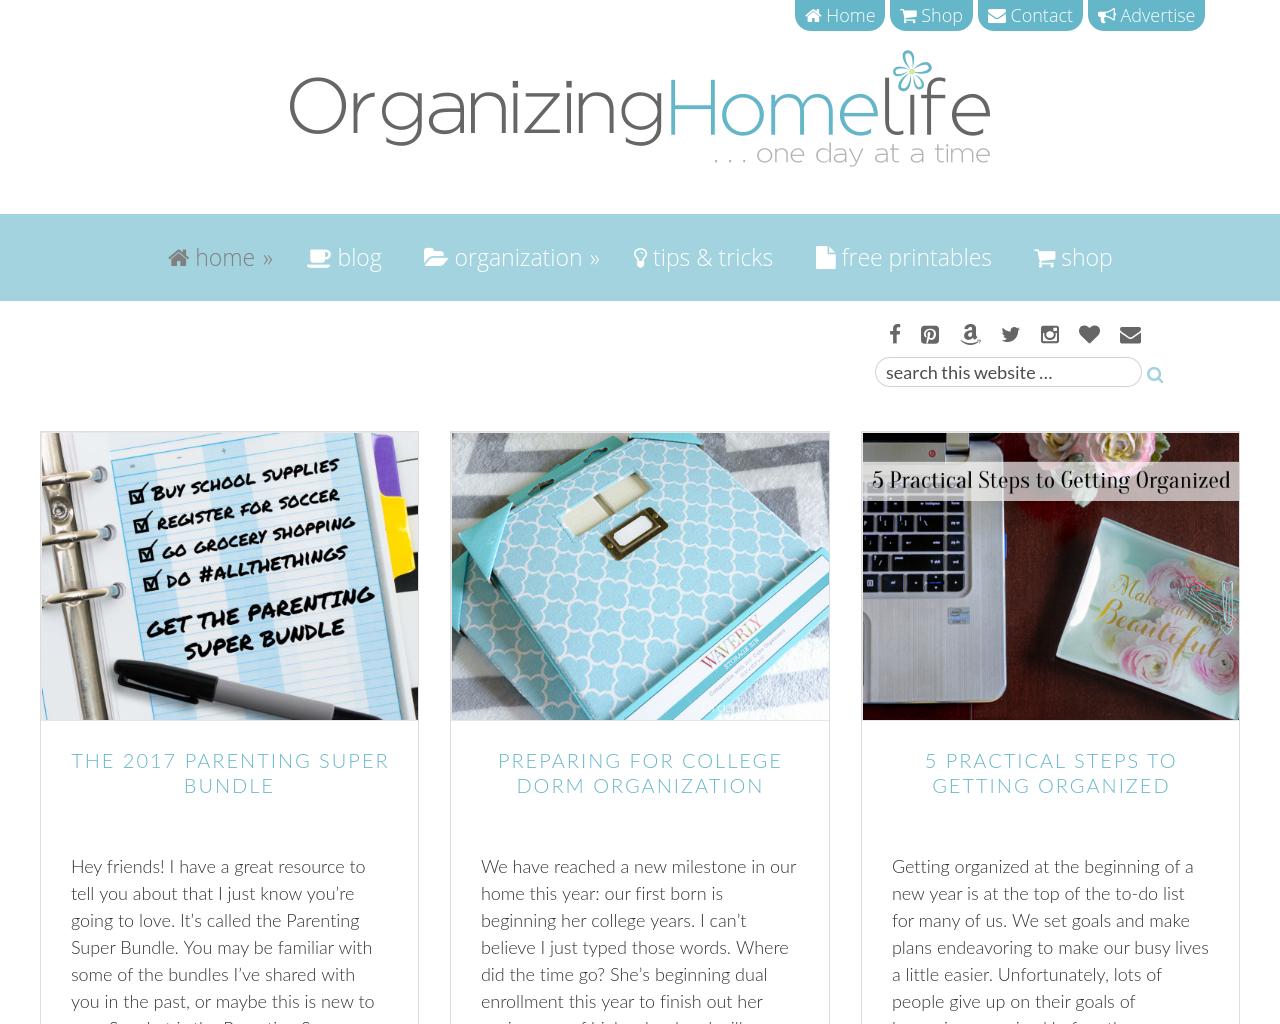 Organizing-Homelife-Advertising-Reviews-Pricing